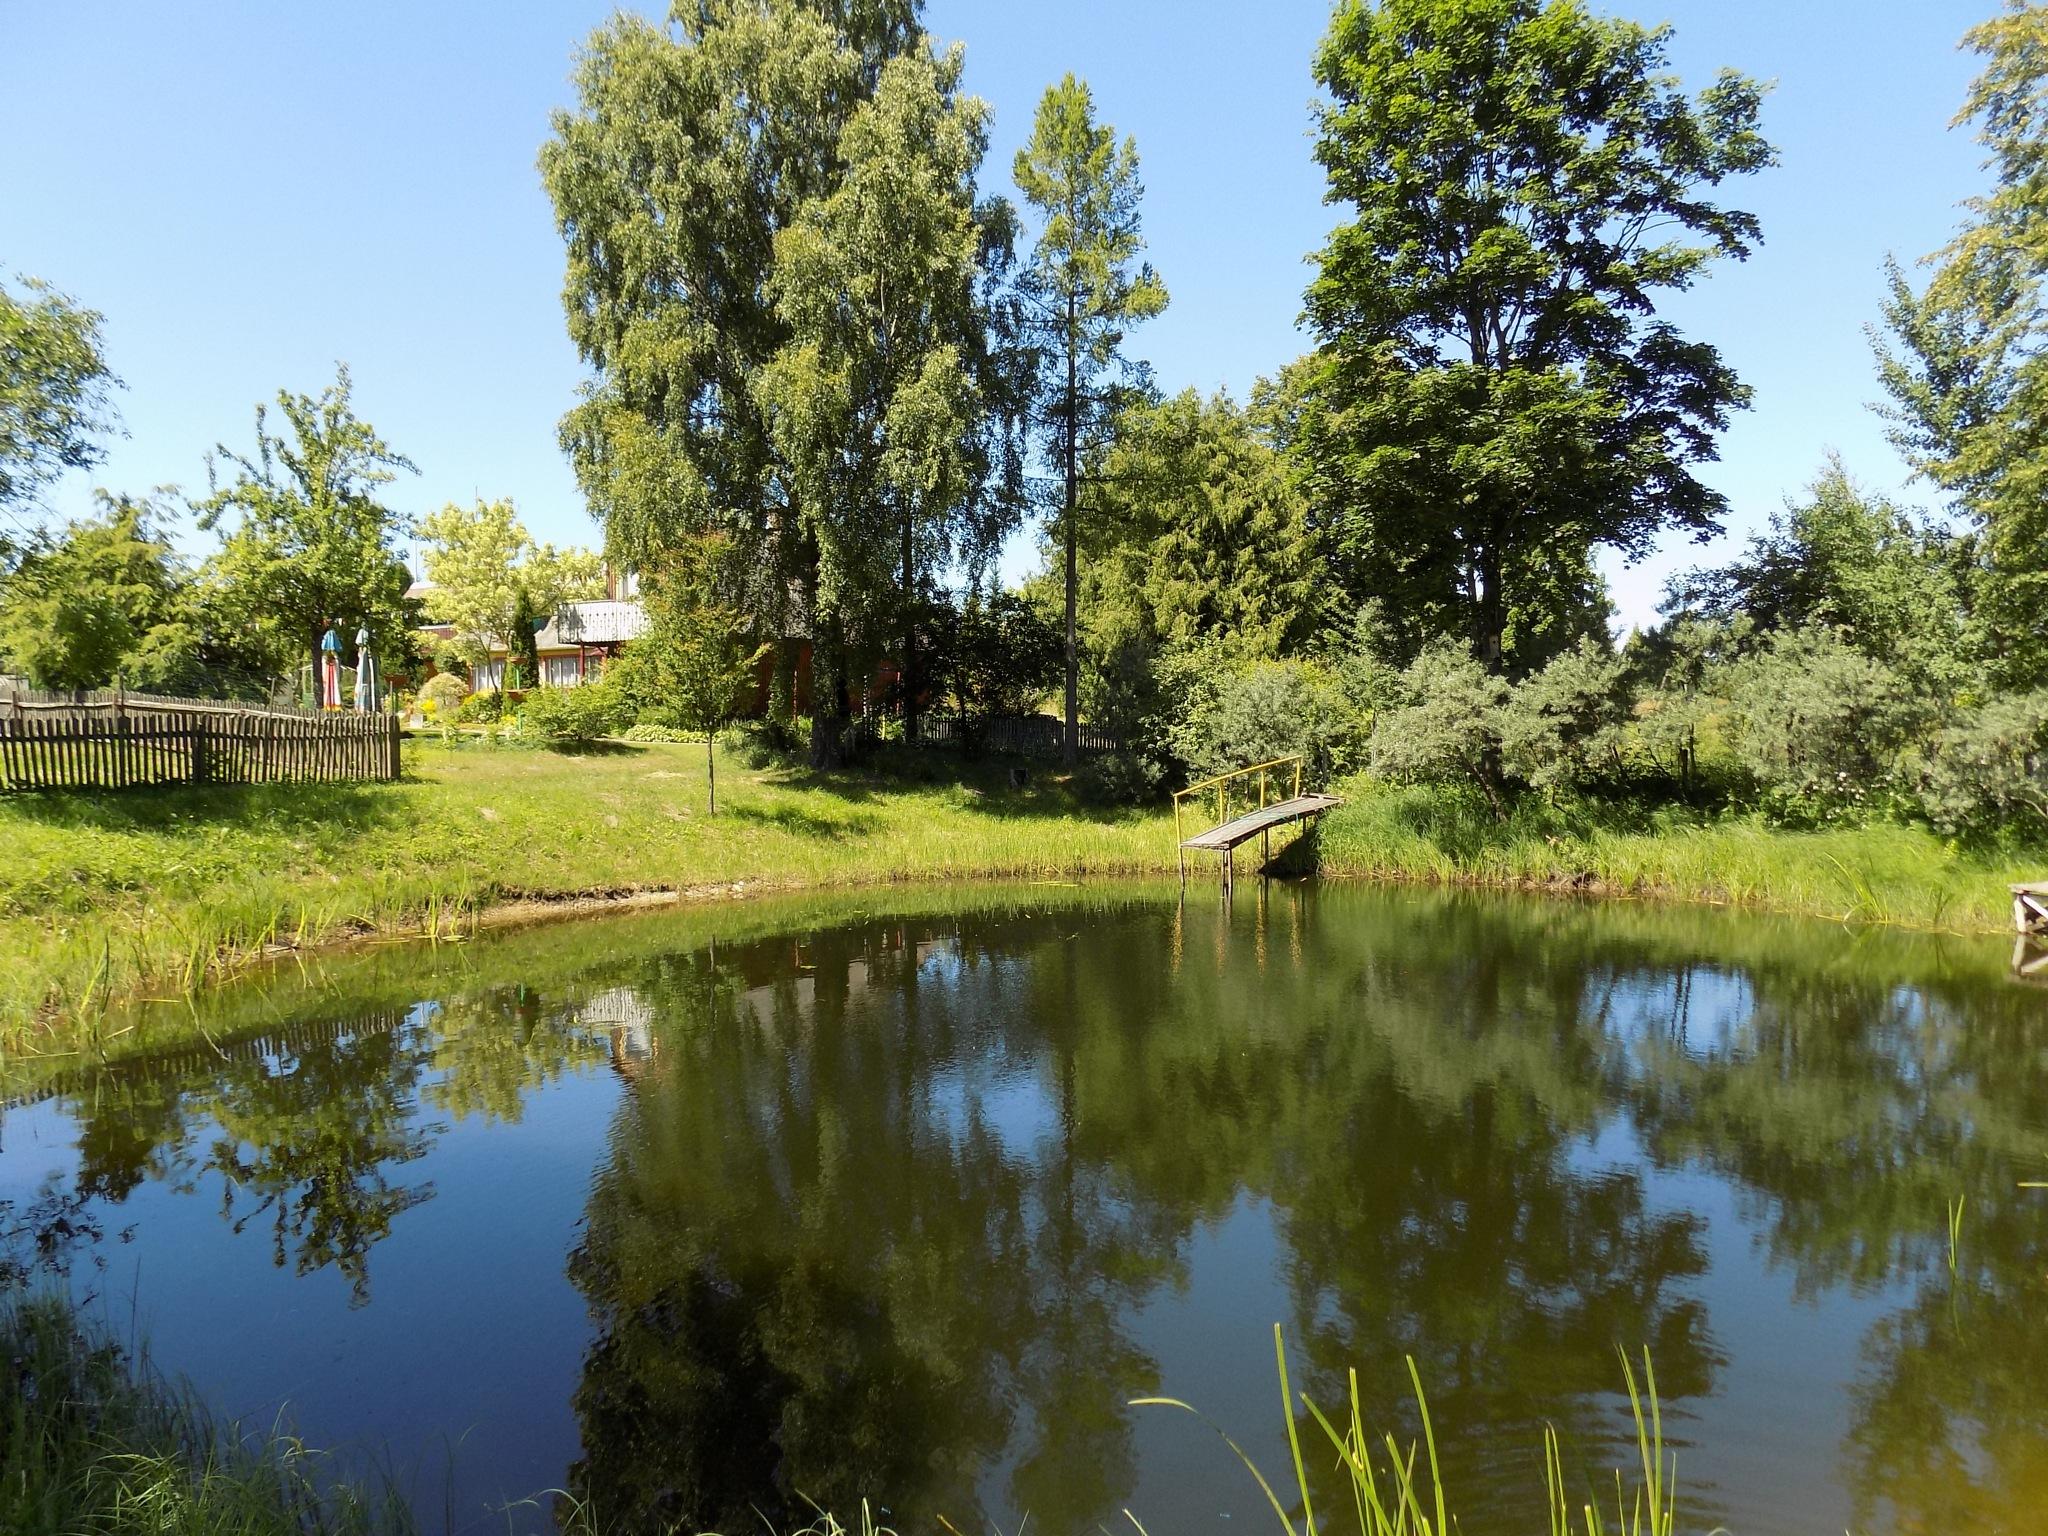 Trees next to the pond by uzkuraitiene62